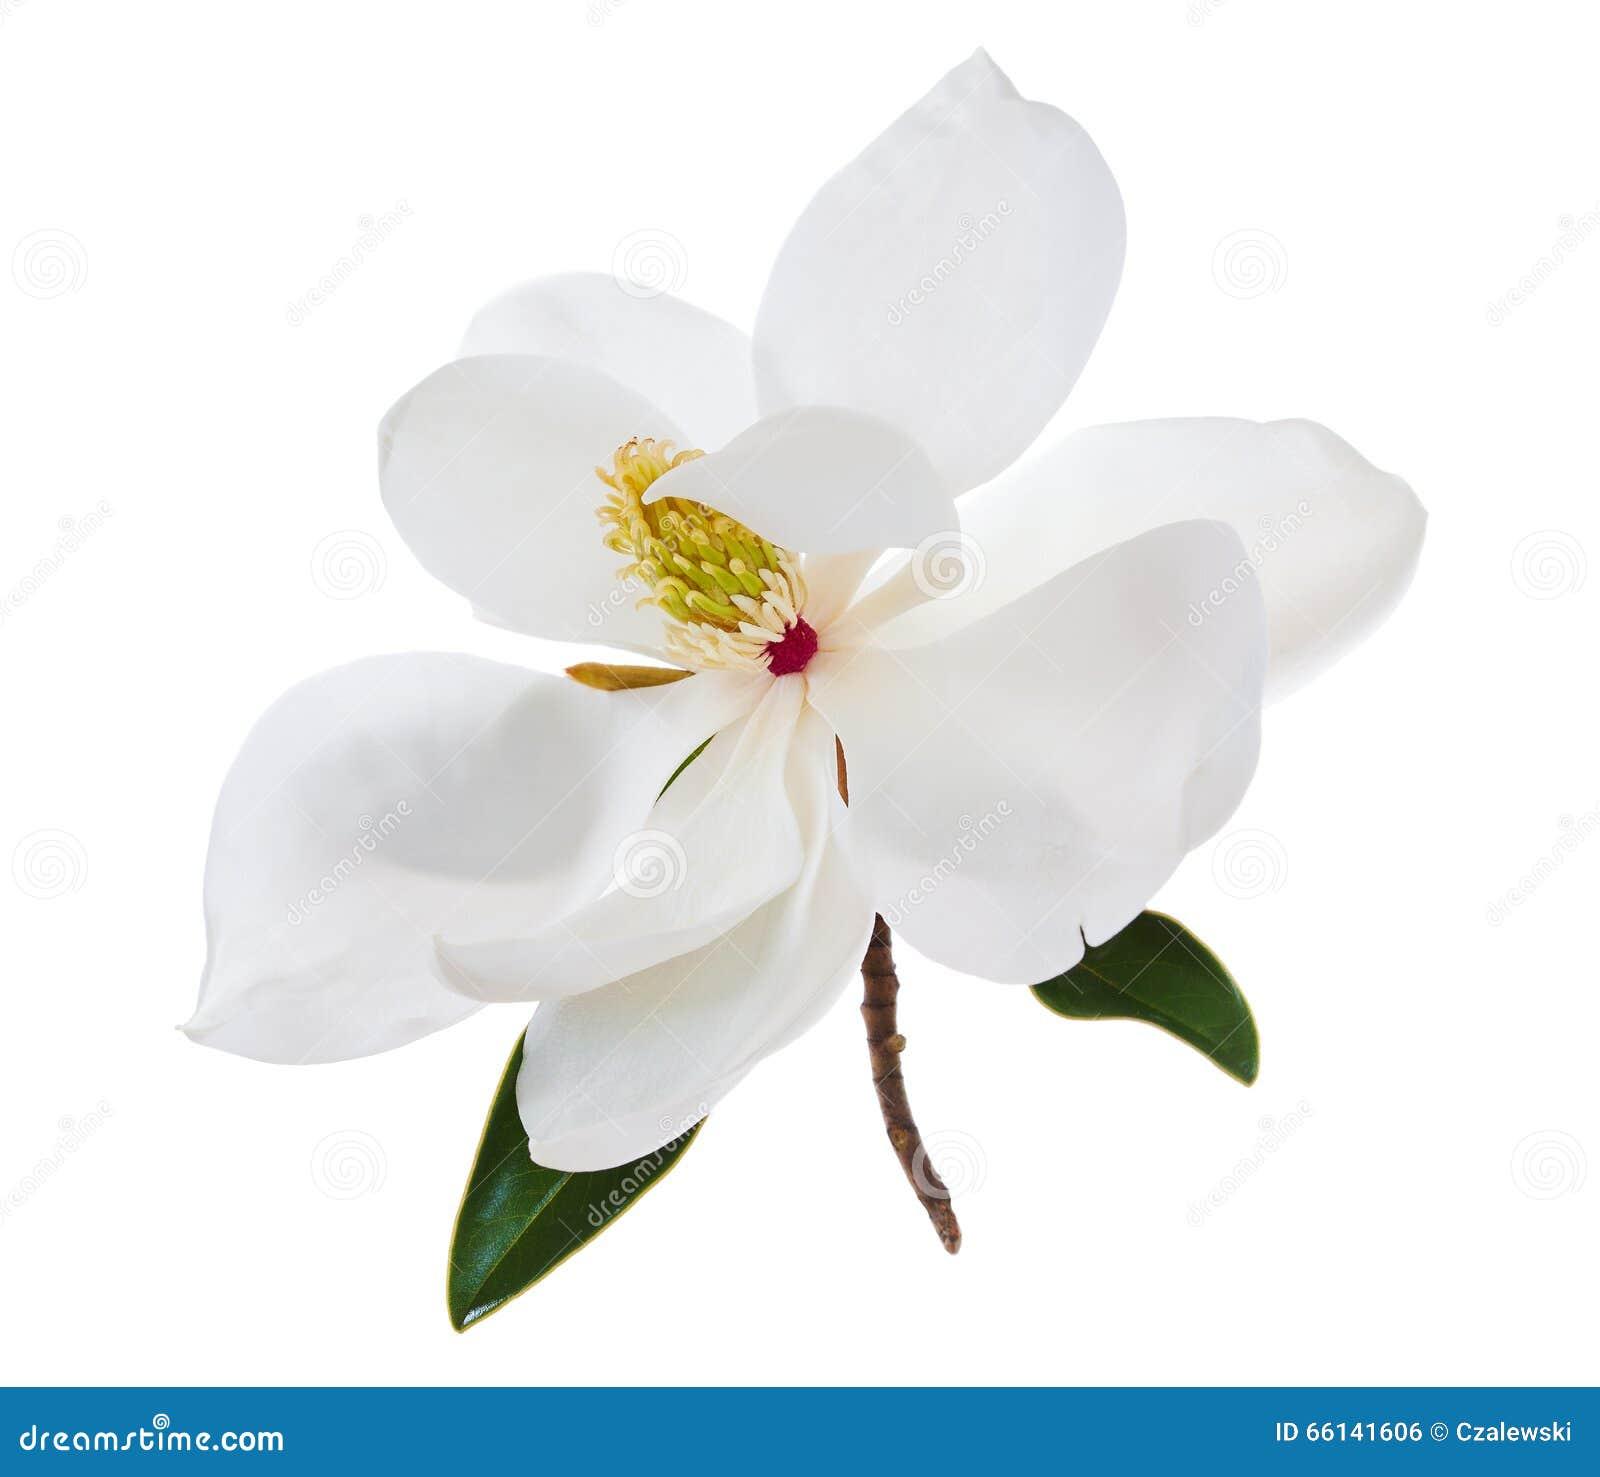 White magnolia flower magnolias flower stock photo image of white magnolia flower magnolias flower mightylinksfo